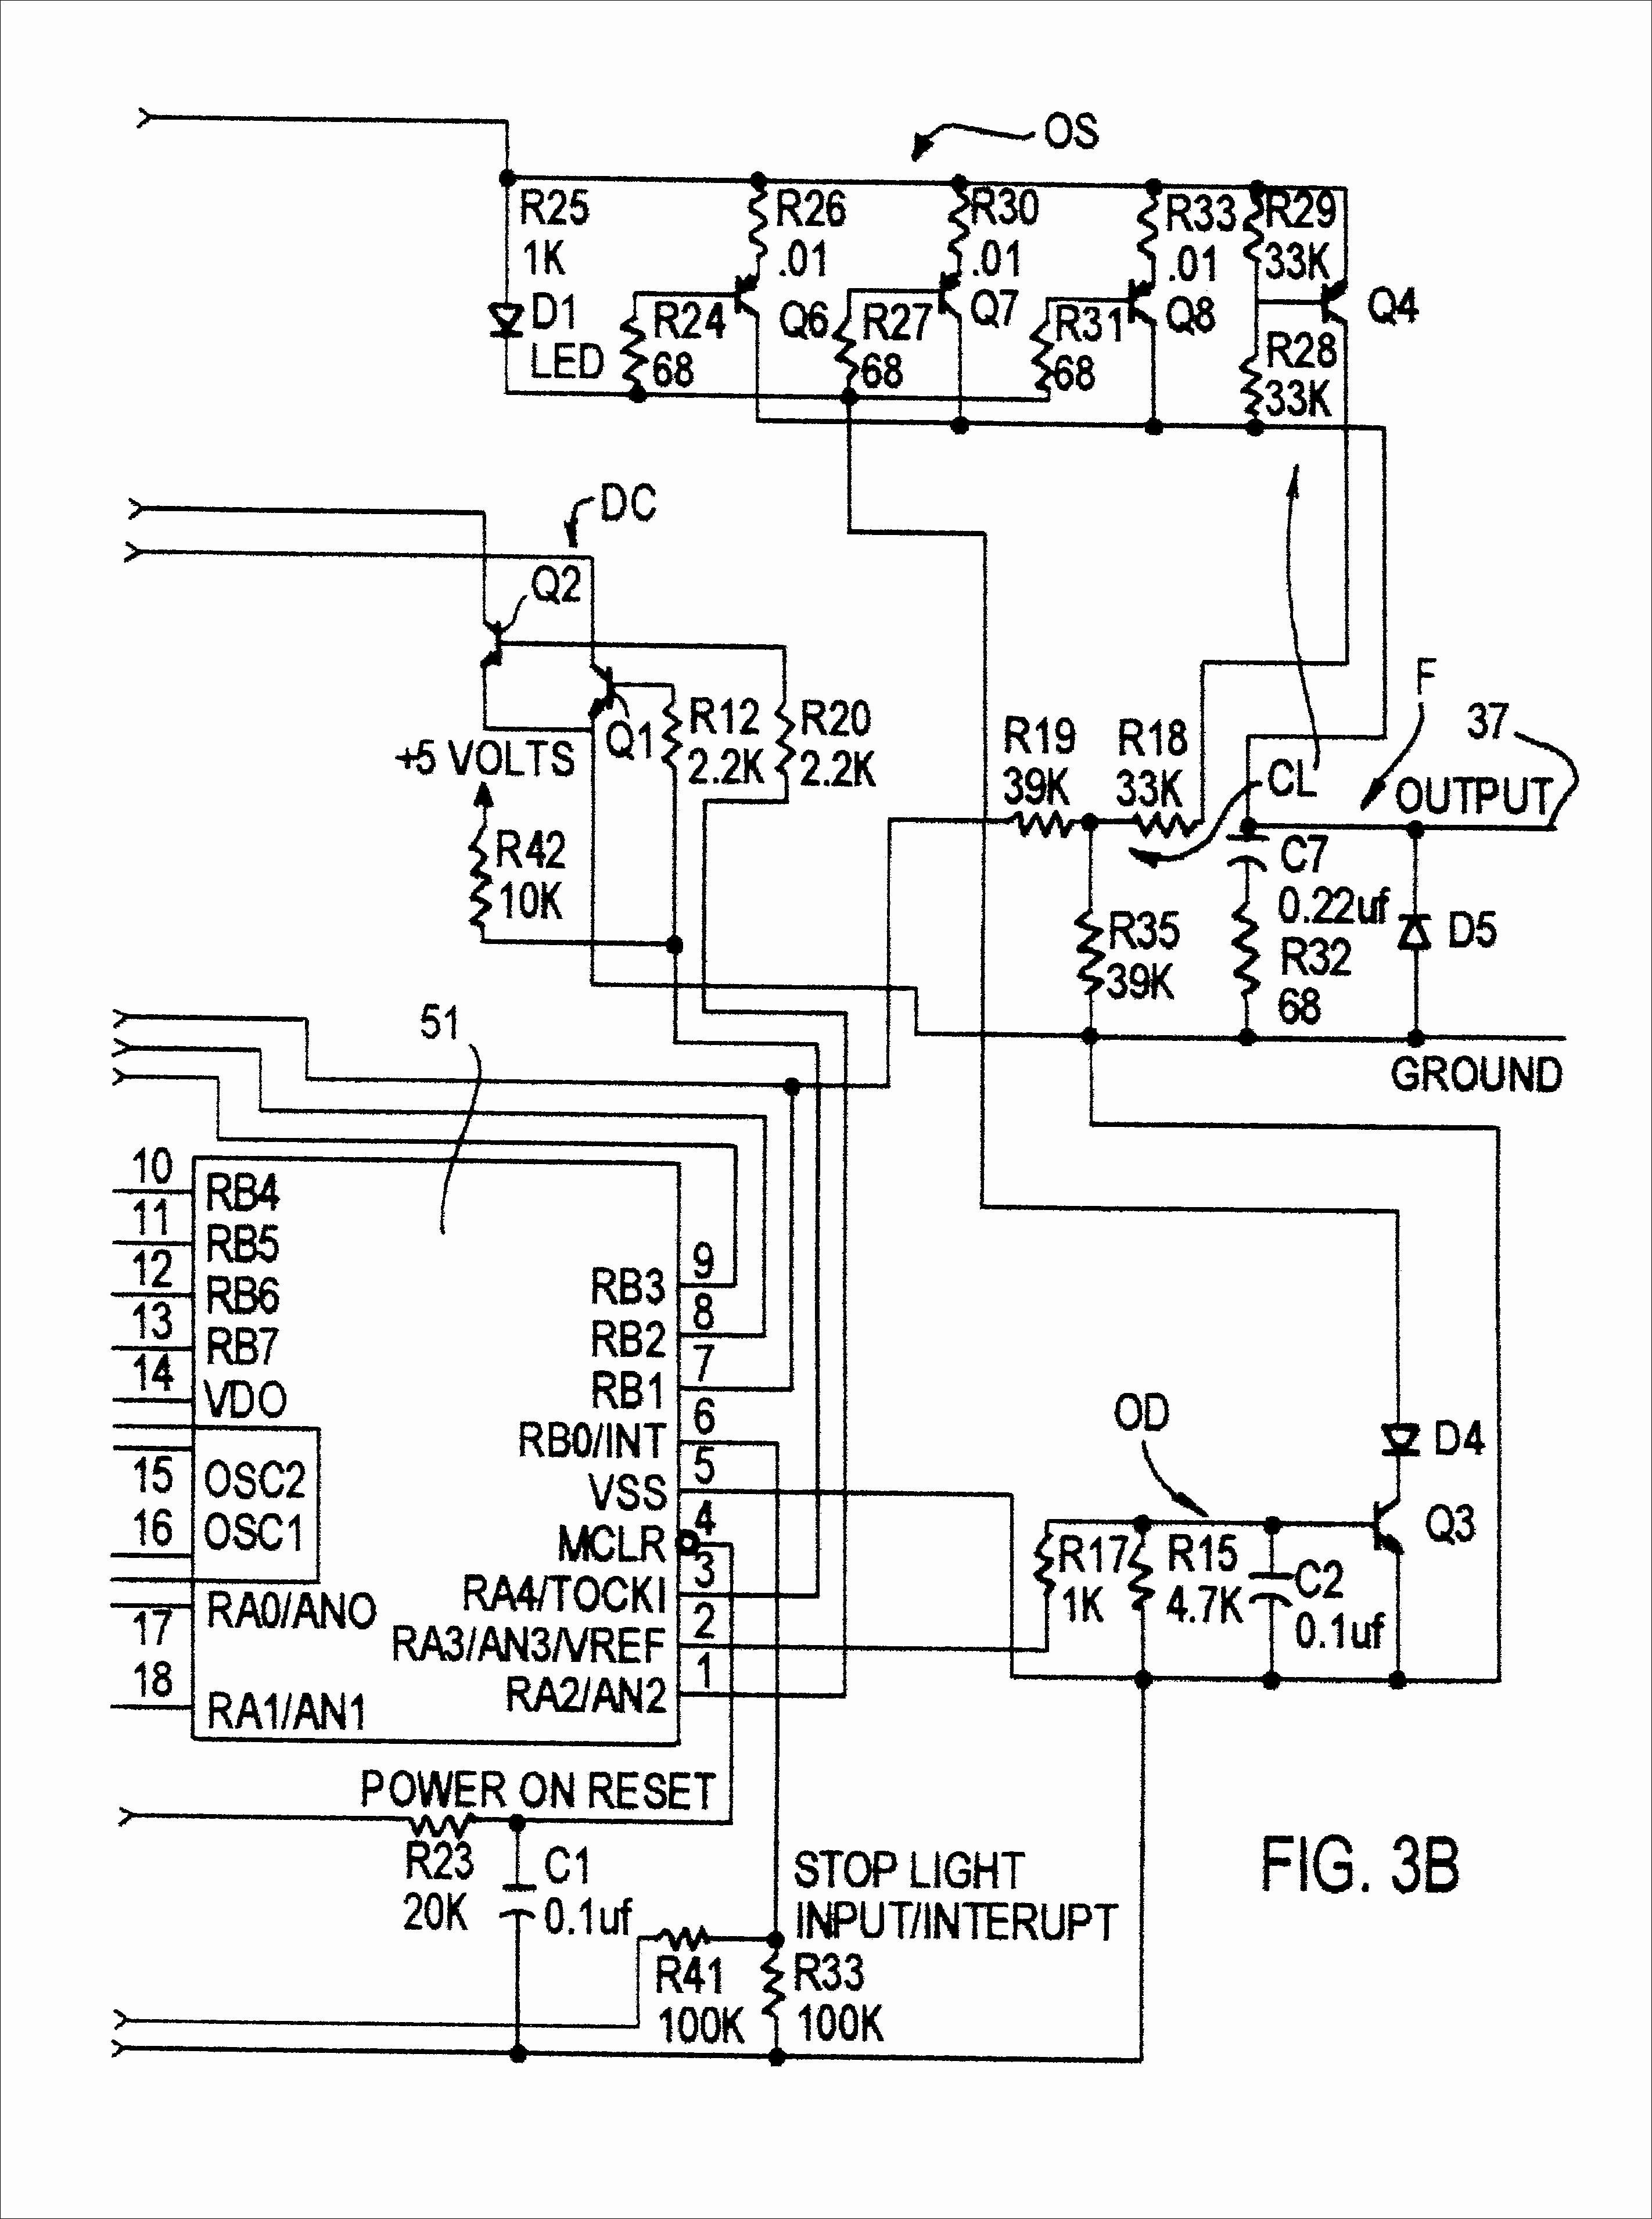 1990 Acura Integra Transmission Sensor Wiring Diagram Trusted 1990 Acura  Integra Wiring Diagram Auto Diagrams